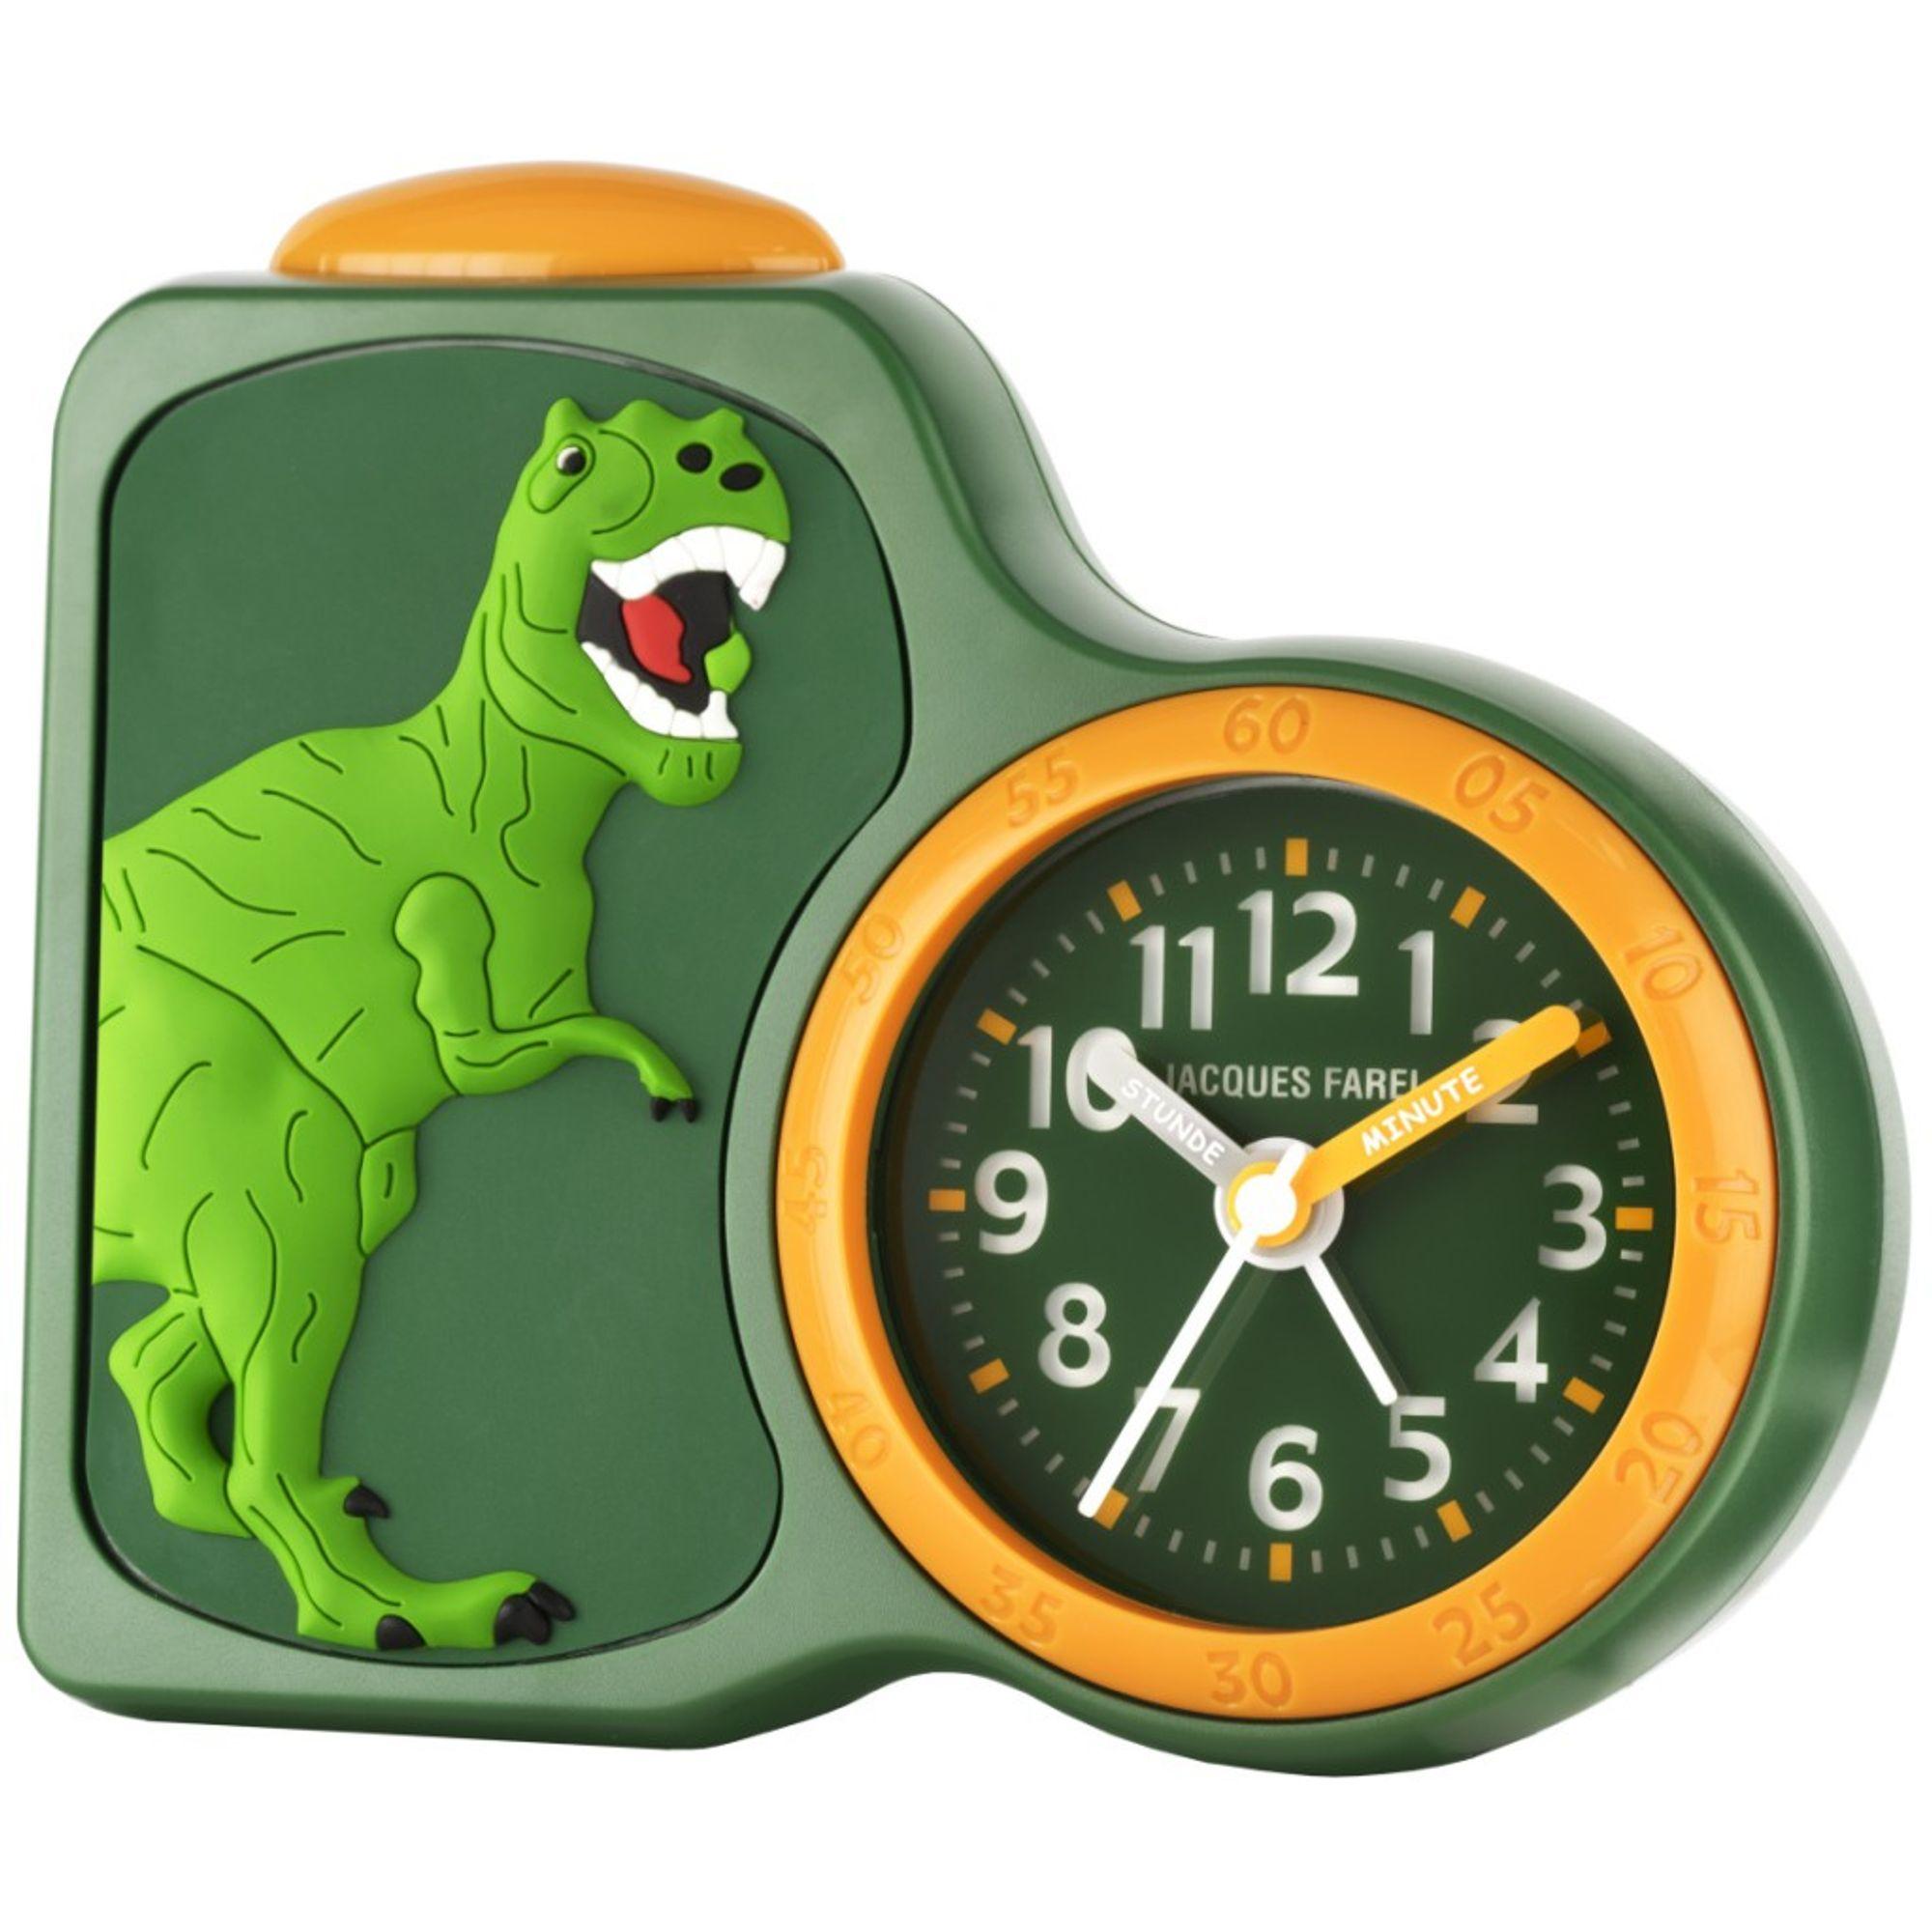 jacques farel acb06dino g dinosaurier wecker junge alarm. Black Bedroom Furniture Sets. Home Design Ideas